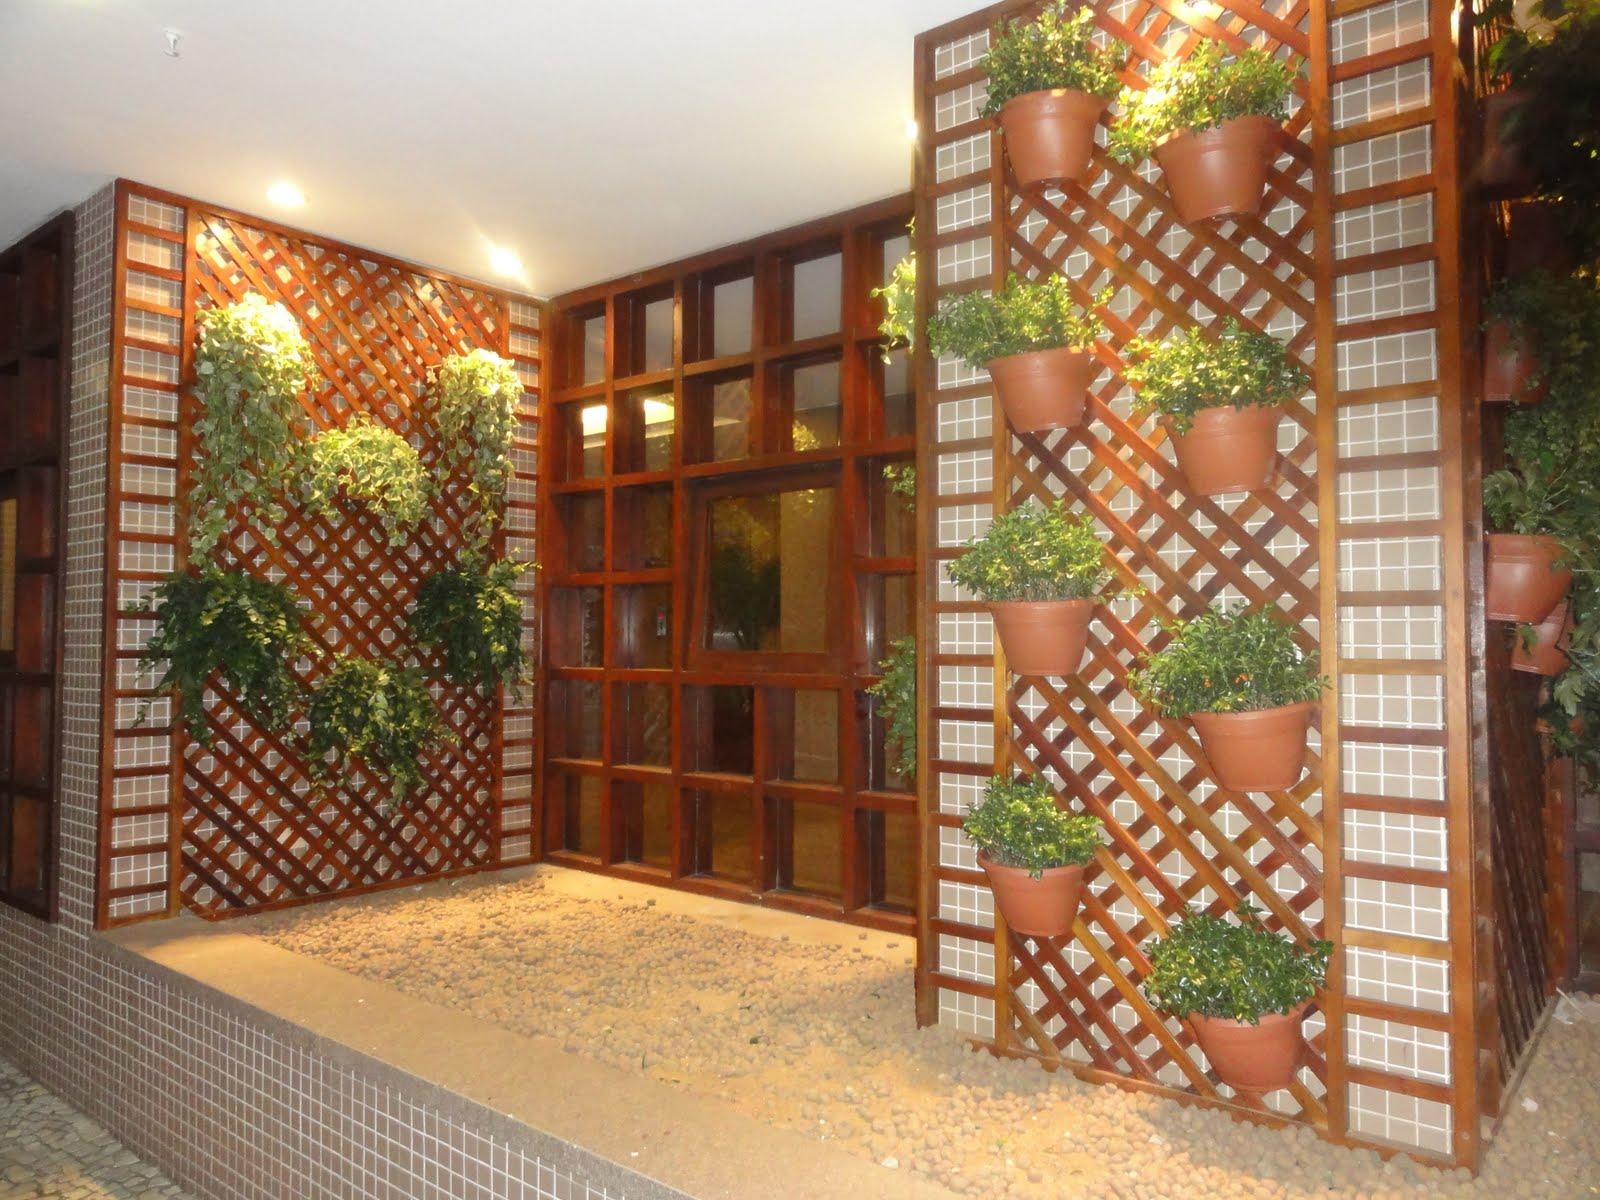 fotos jardim horizontal : fotos jardim horizontal:Blog da Paisagista: Jardim vertical